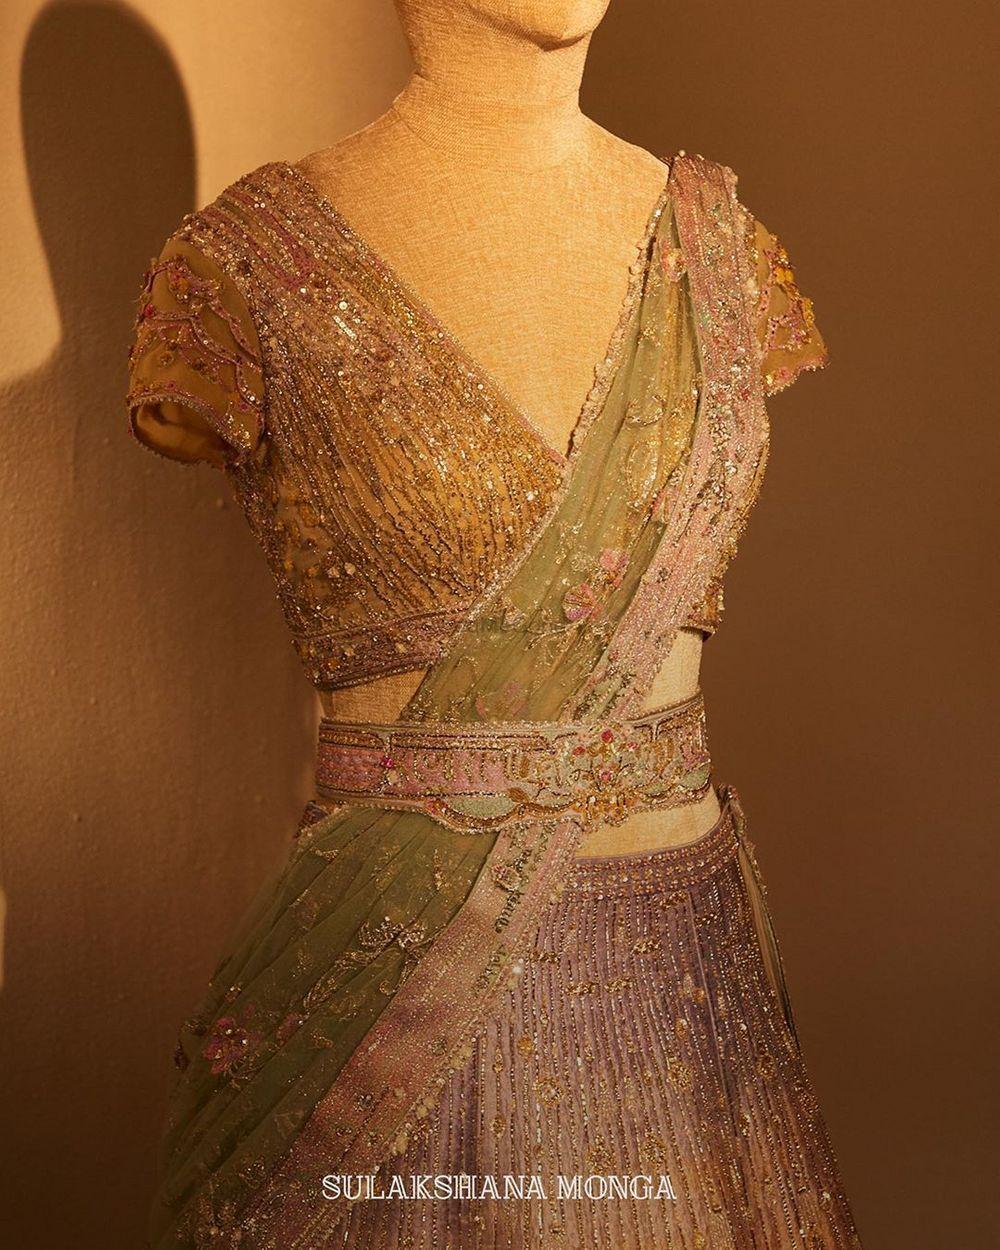 Photo By Sulakshana Monga - Bridal Wear